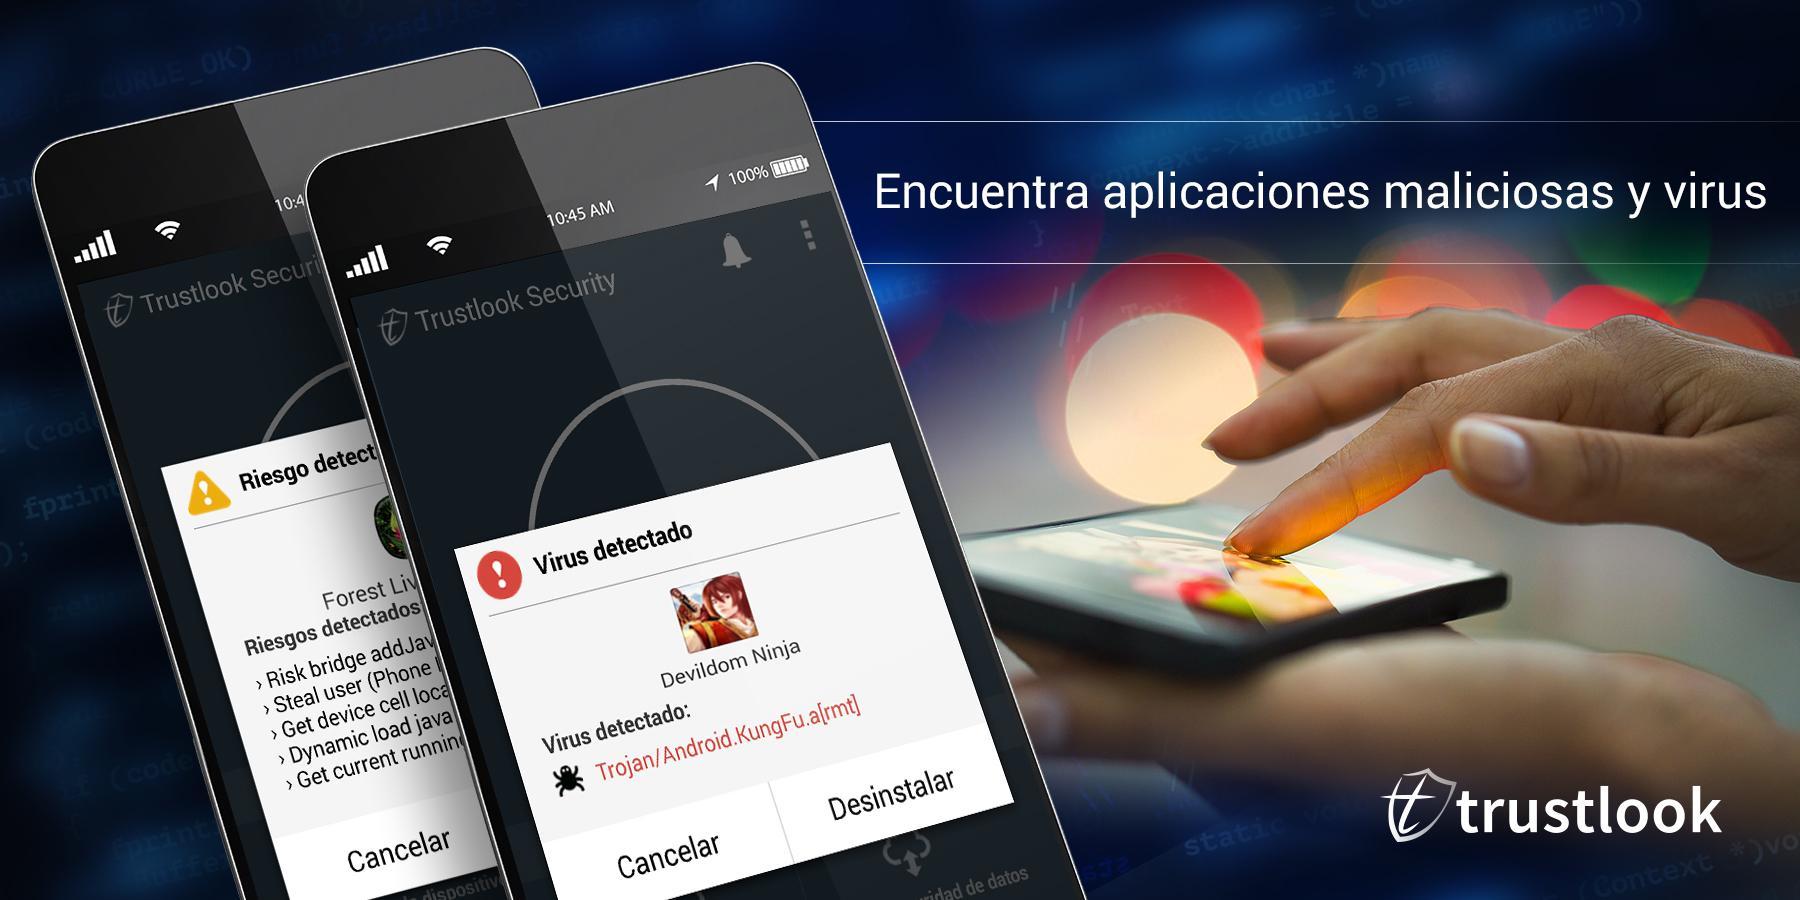 Premium Mobile Antivirus -https://lh3.ggpht.com/10vJszyb0ezdHk6-mt0l-xtwYarutch5KSBQhKKTGkeZkE3hjvEUwqDsHxskXw3TwOO5=h900